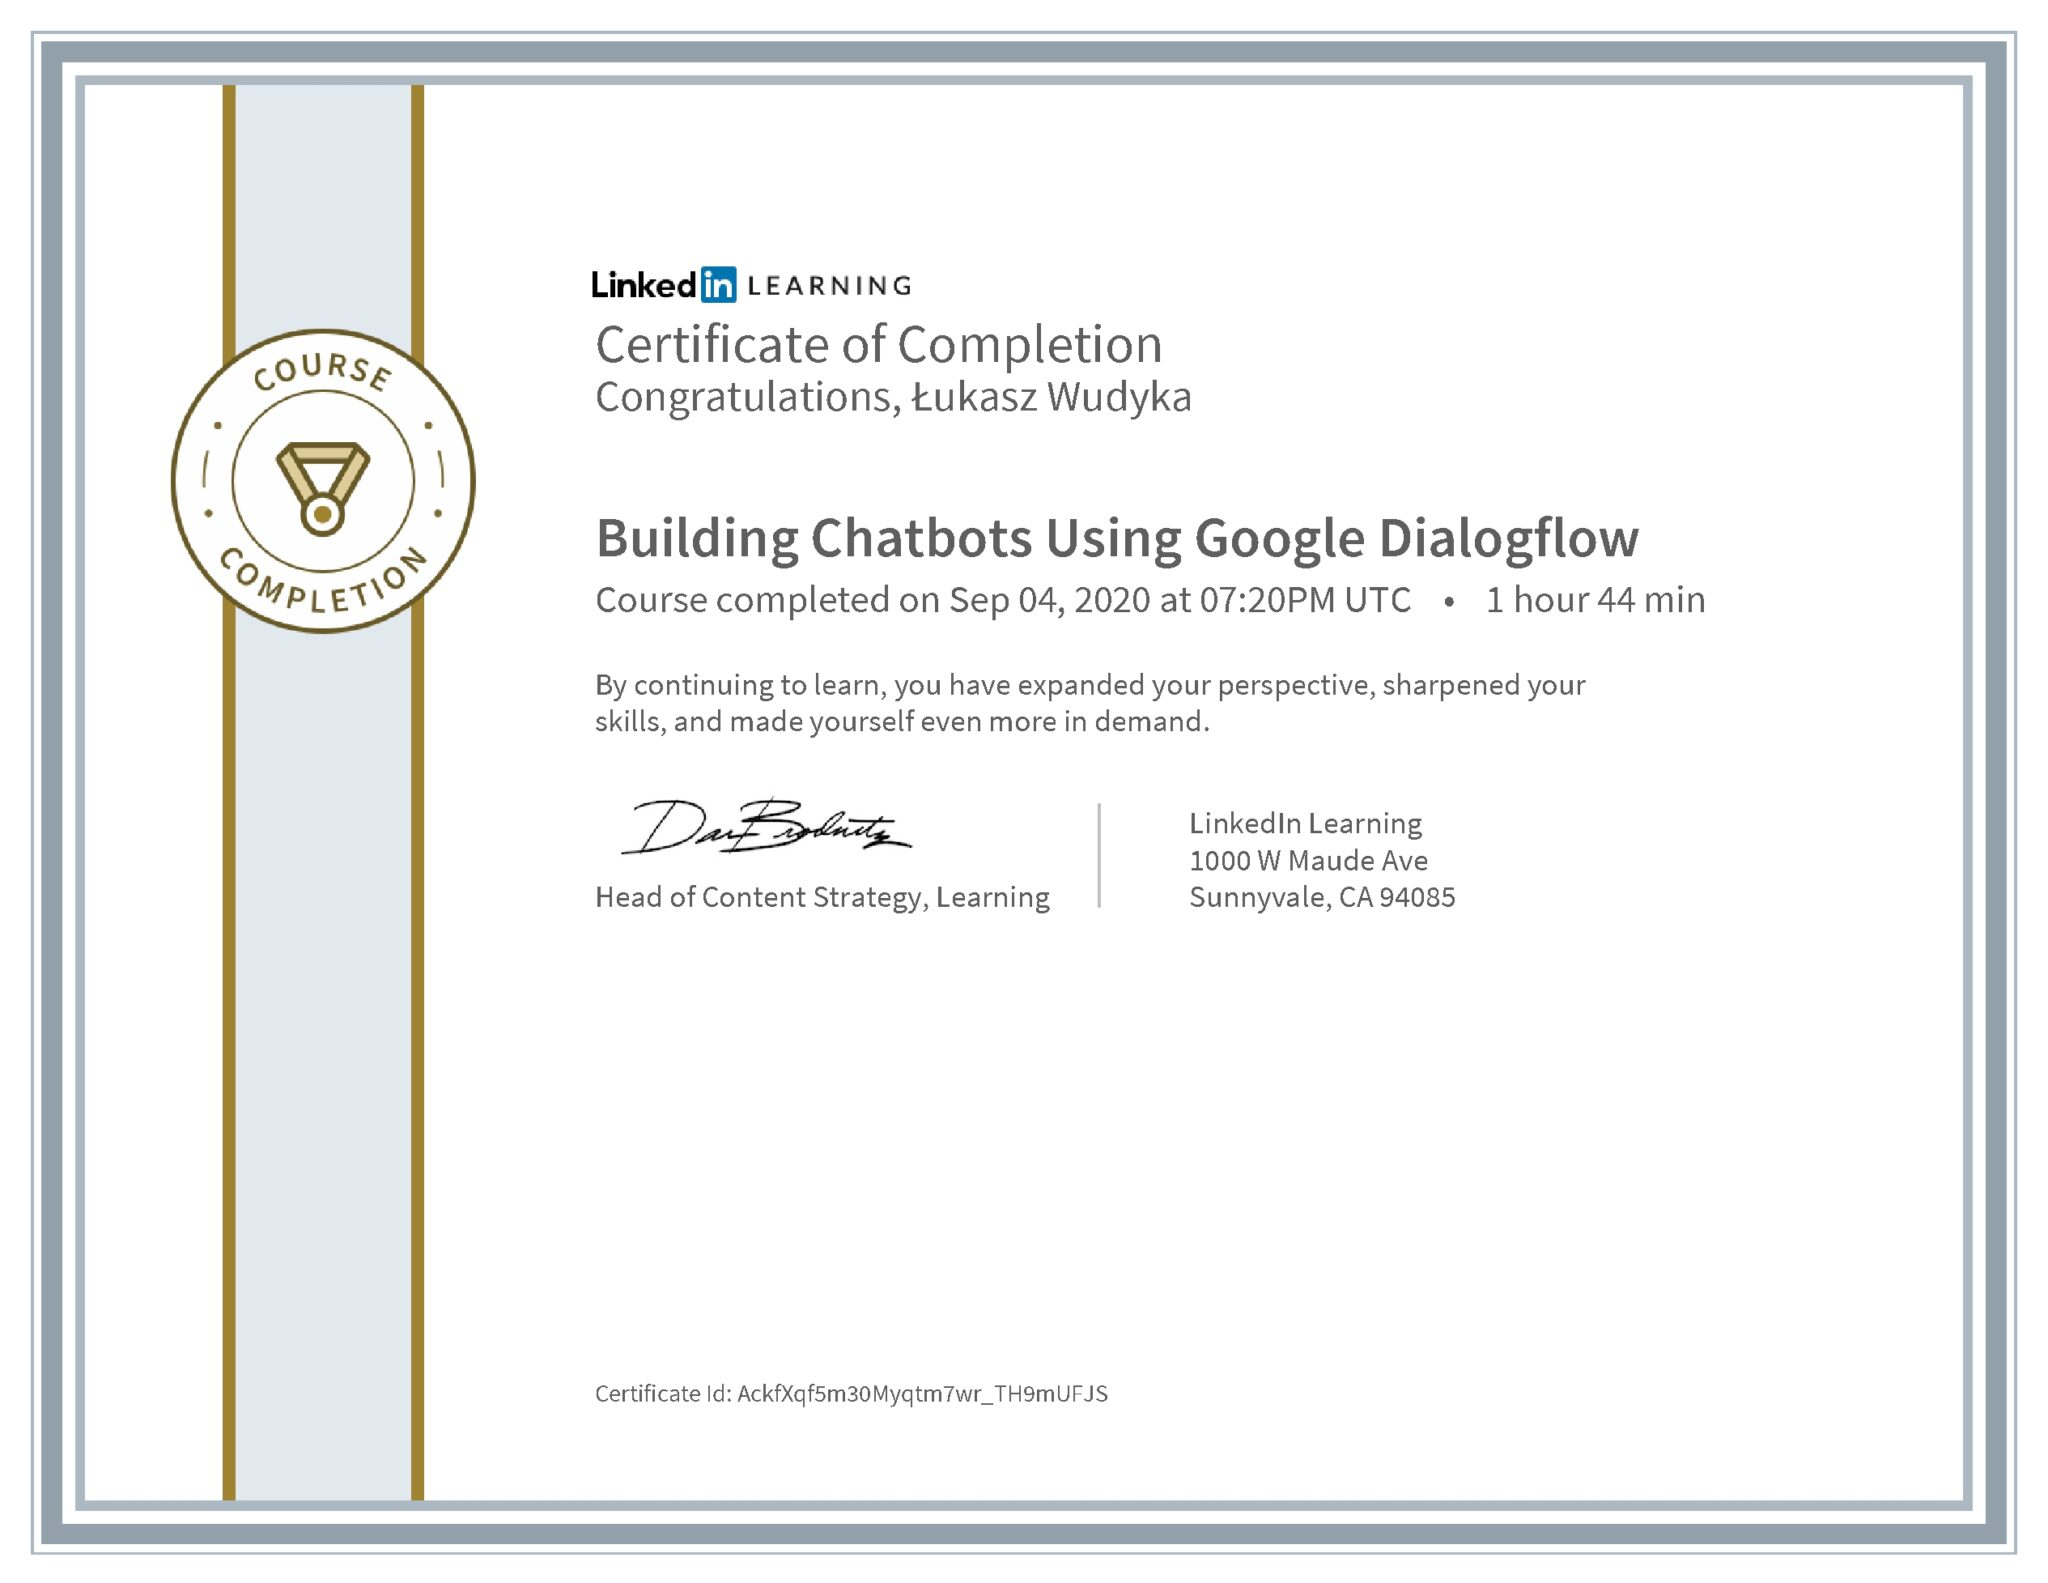 Łukasz Wudyka certyfikat LinkedIn Building Chatbots Using Google Dialogflow